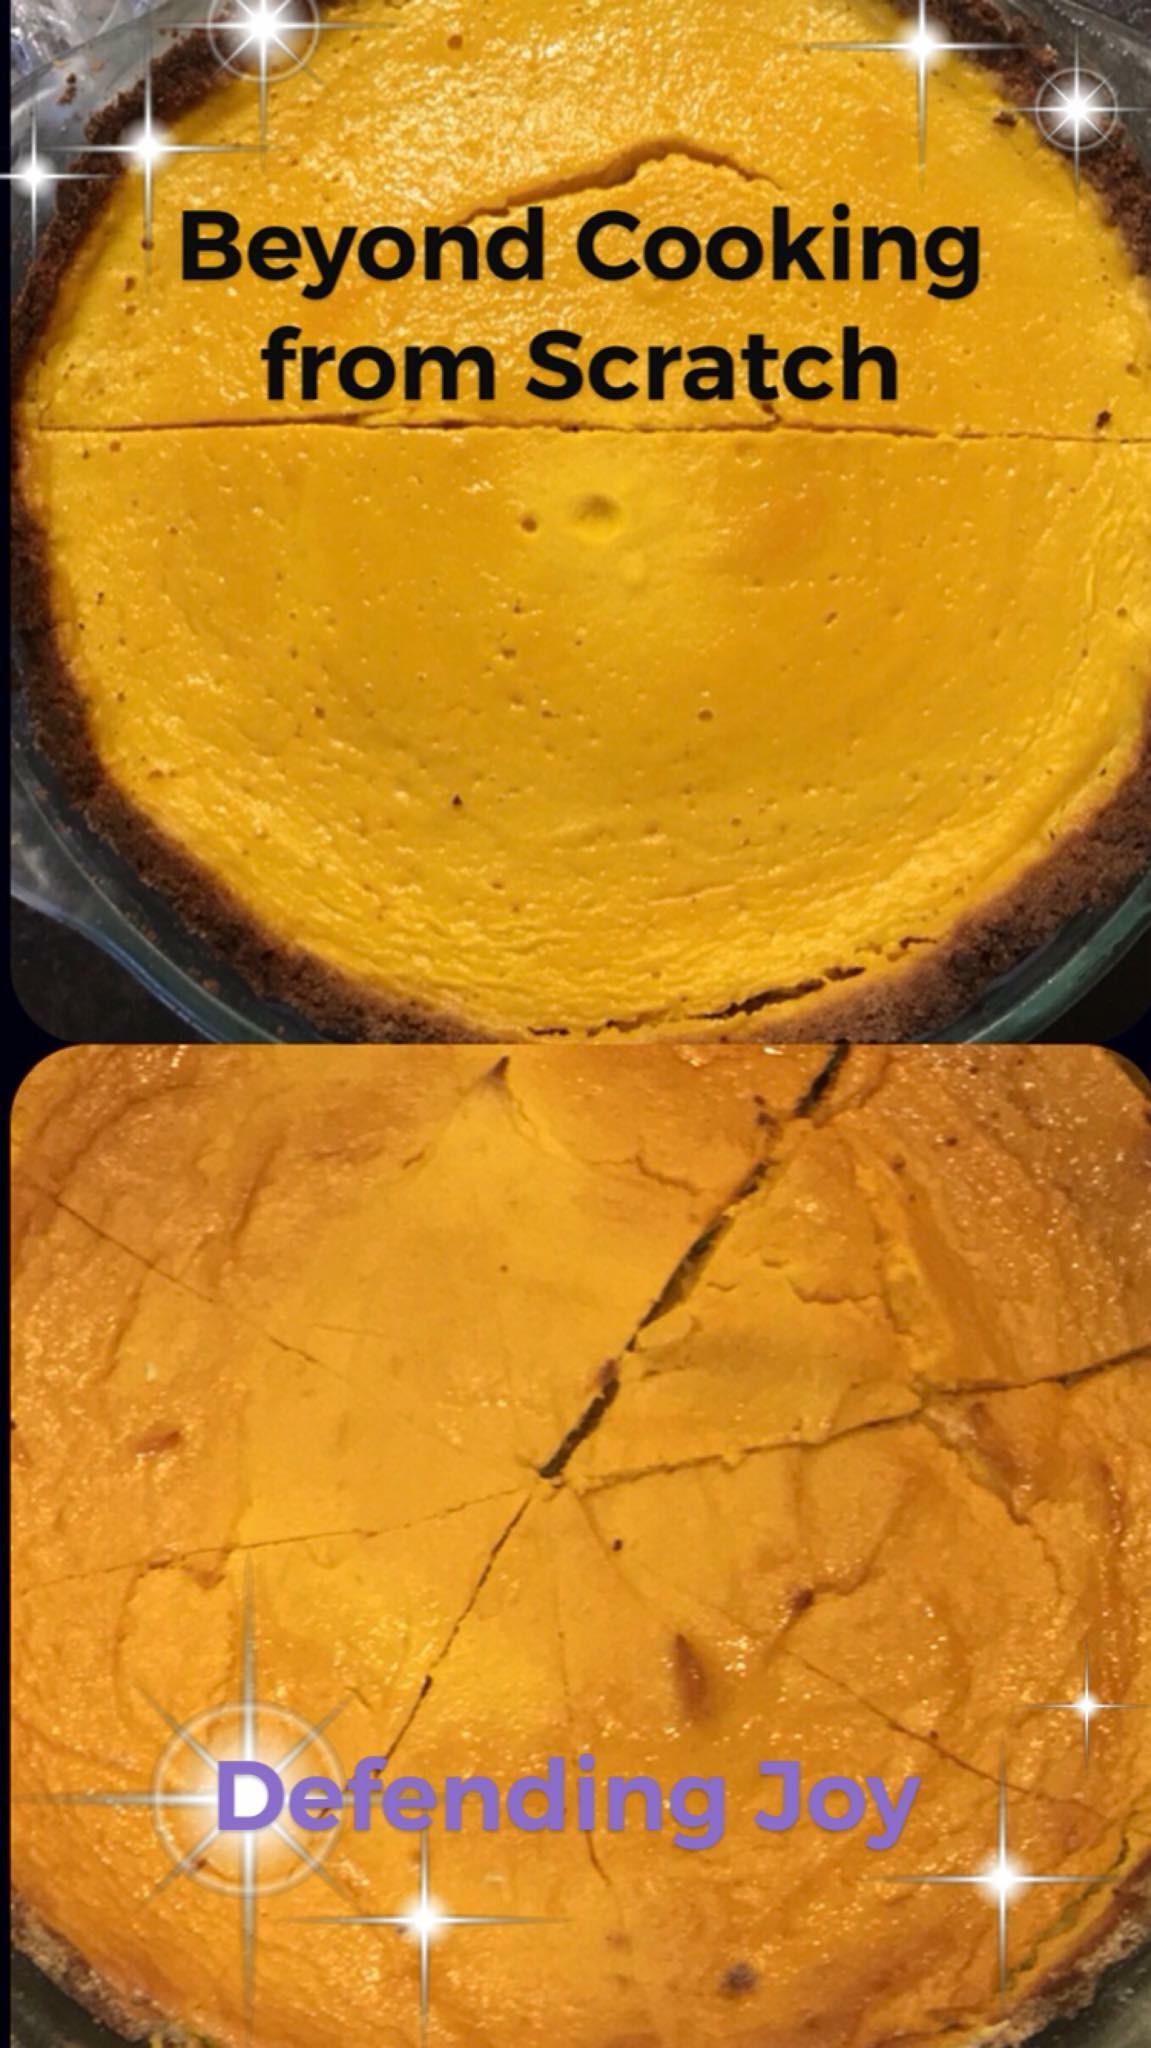 Picture of 2 pumpkin pies